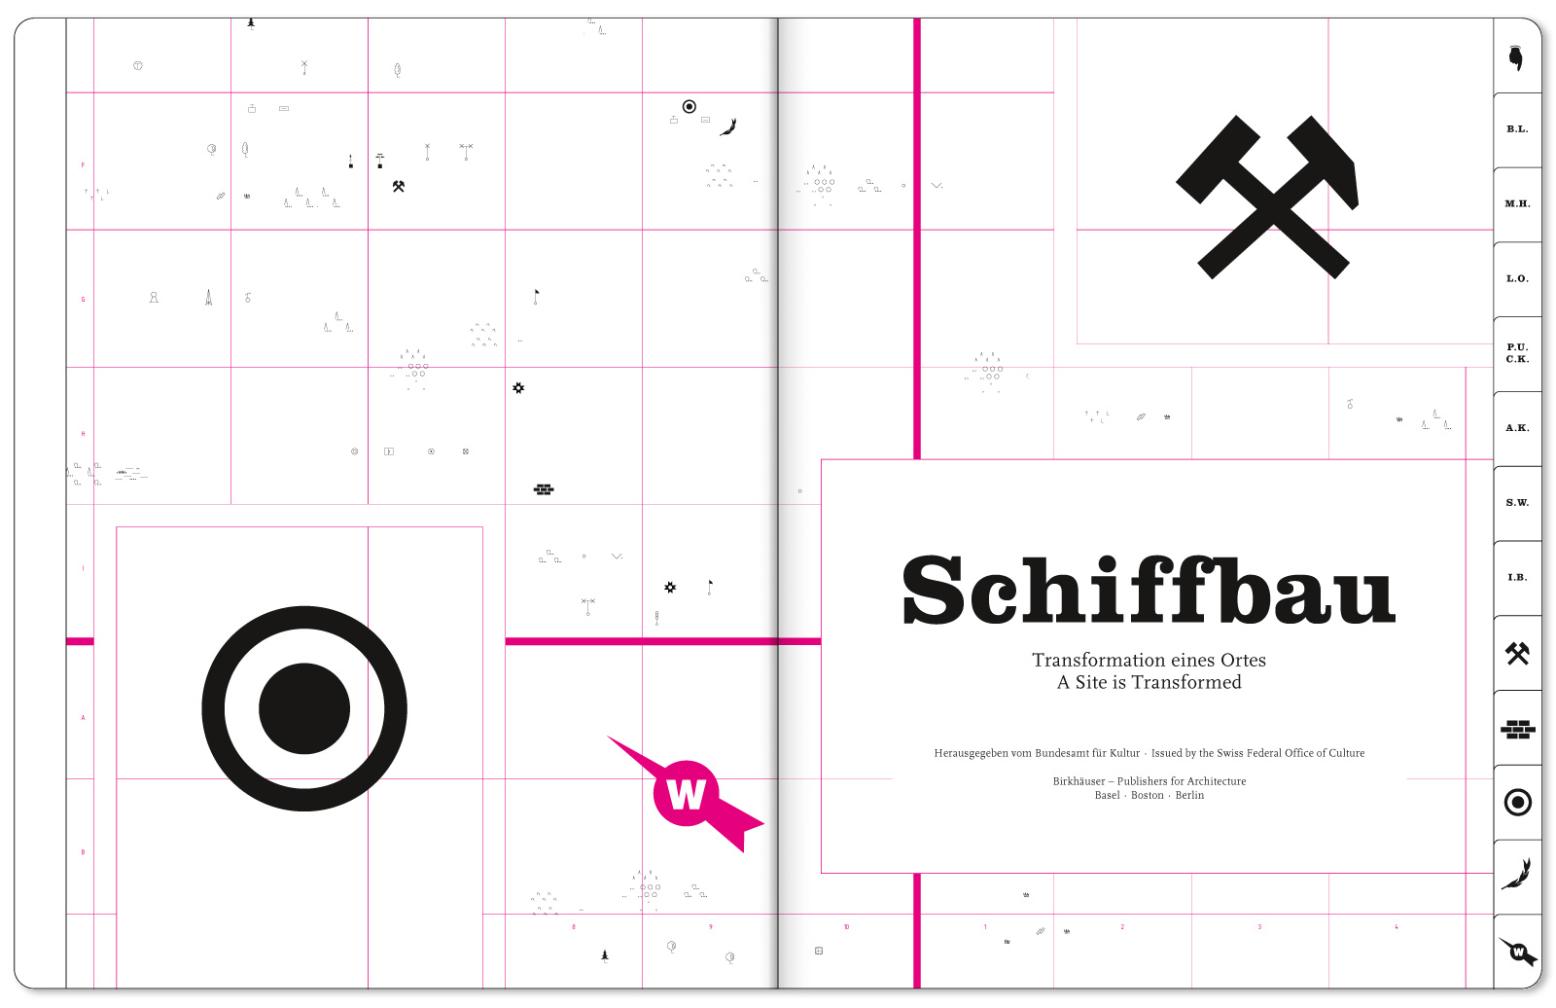 schiffbau_spread_intro_1600px_web